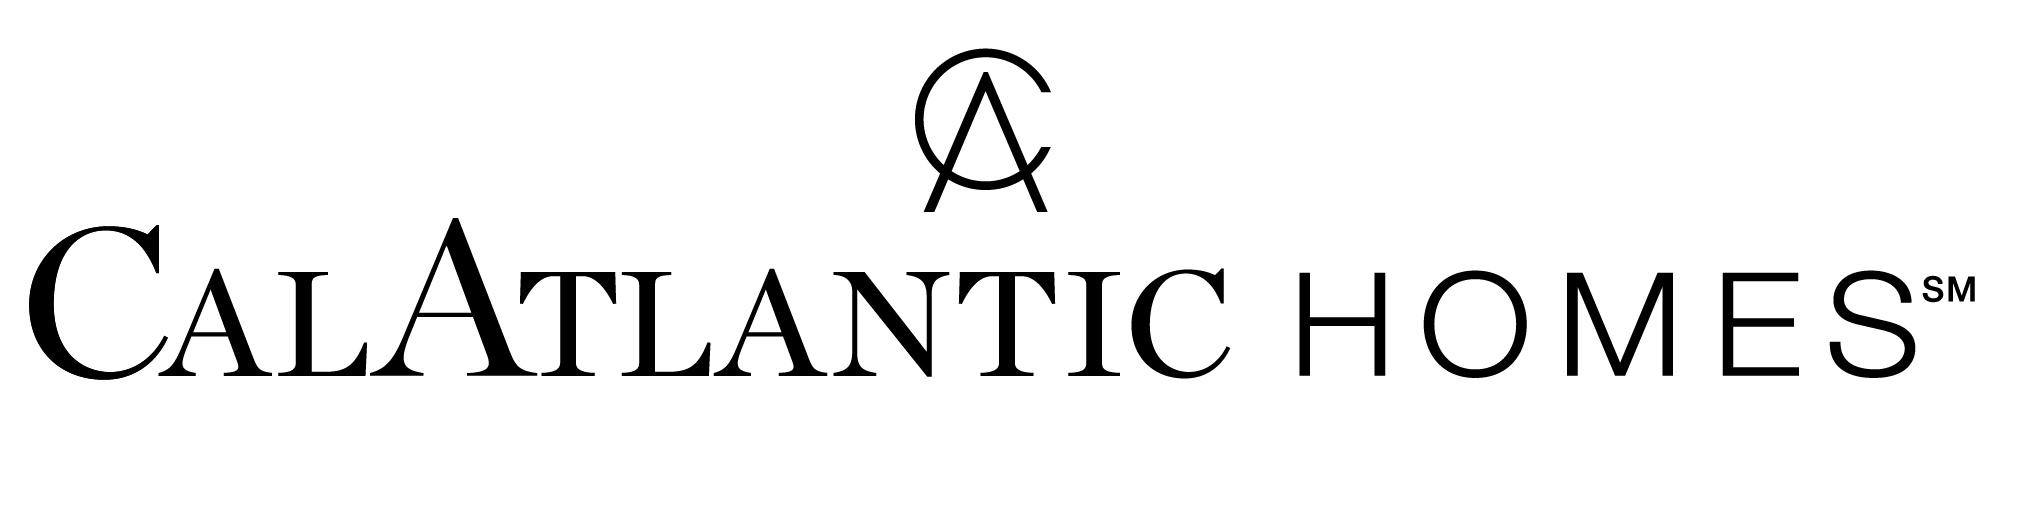 CalAtlantic Group, Inc company logo